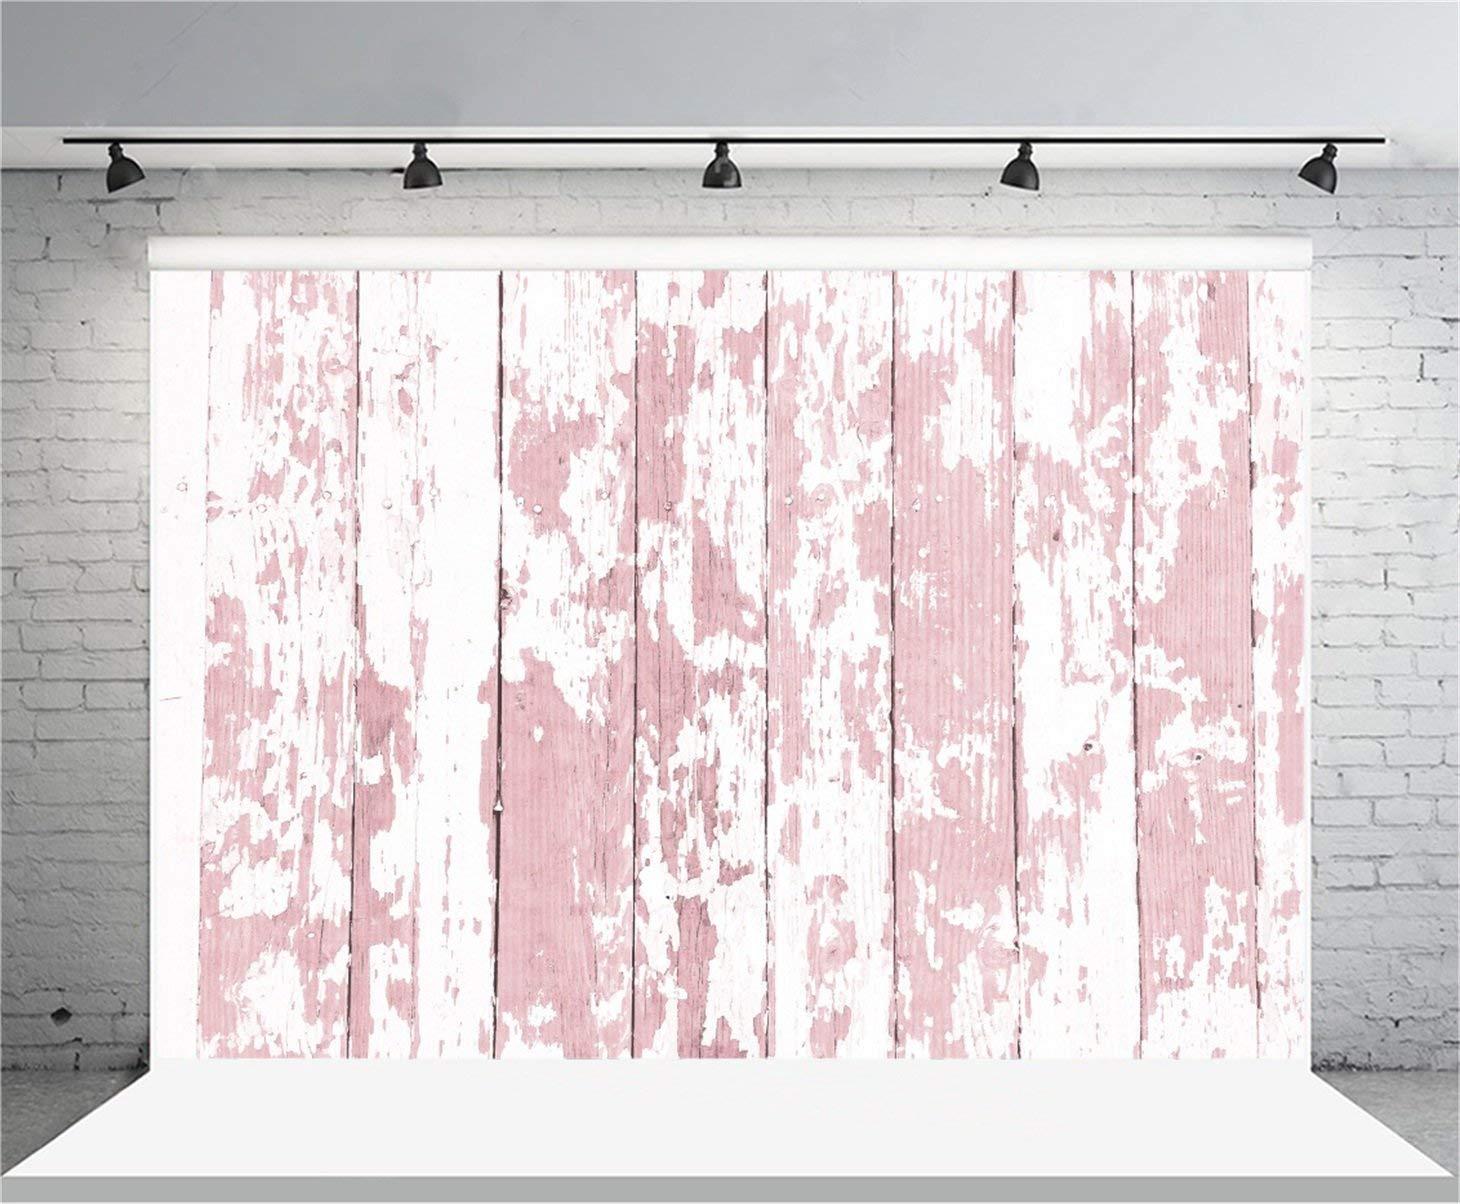 AOFOTO 7x5ft Grunge Wooden Plank Photography Background Vintage Shabby Peeling Painted Wood Board Backdrop Kid Girl Boy Adult Baby Artistic Portrait Photoshoot Studio Props Video Drape Wallpaper